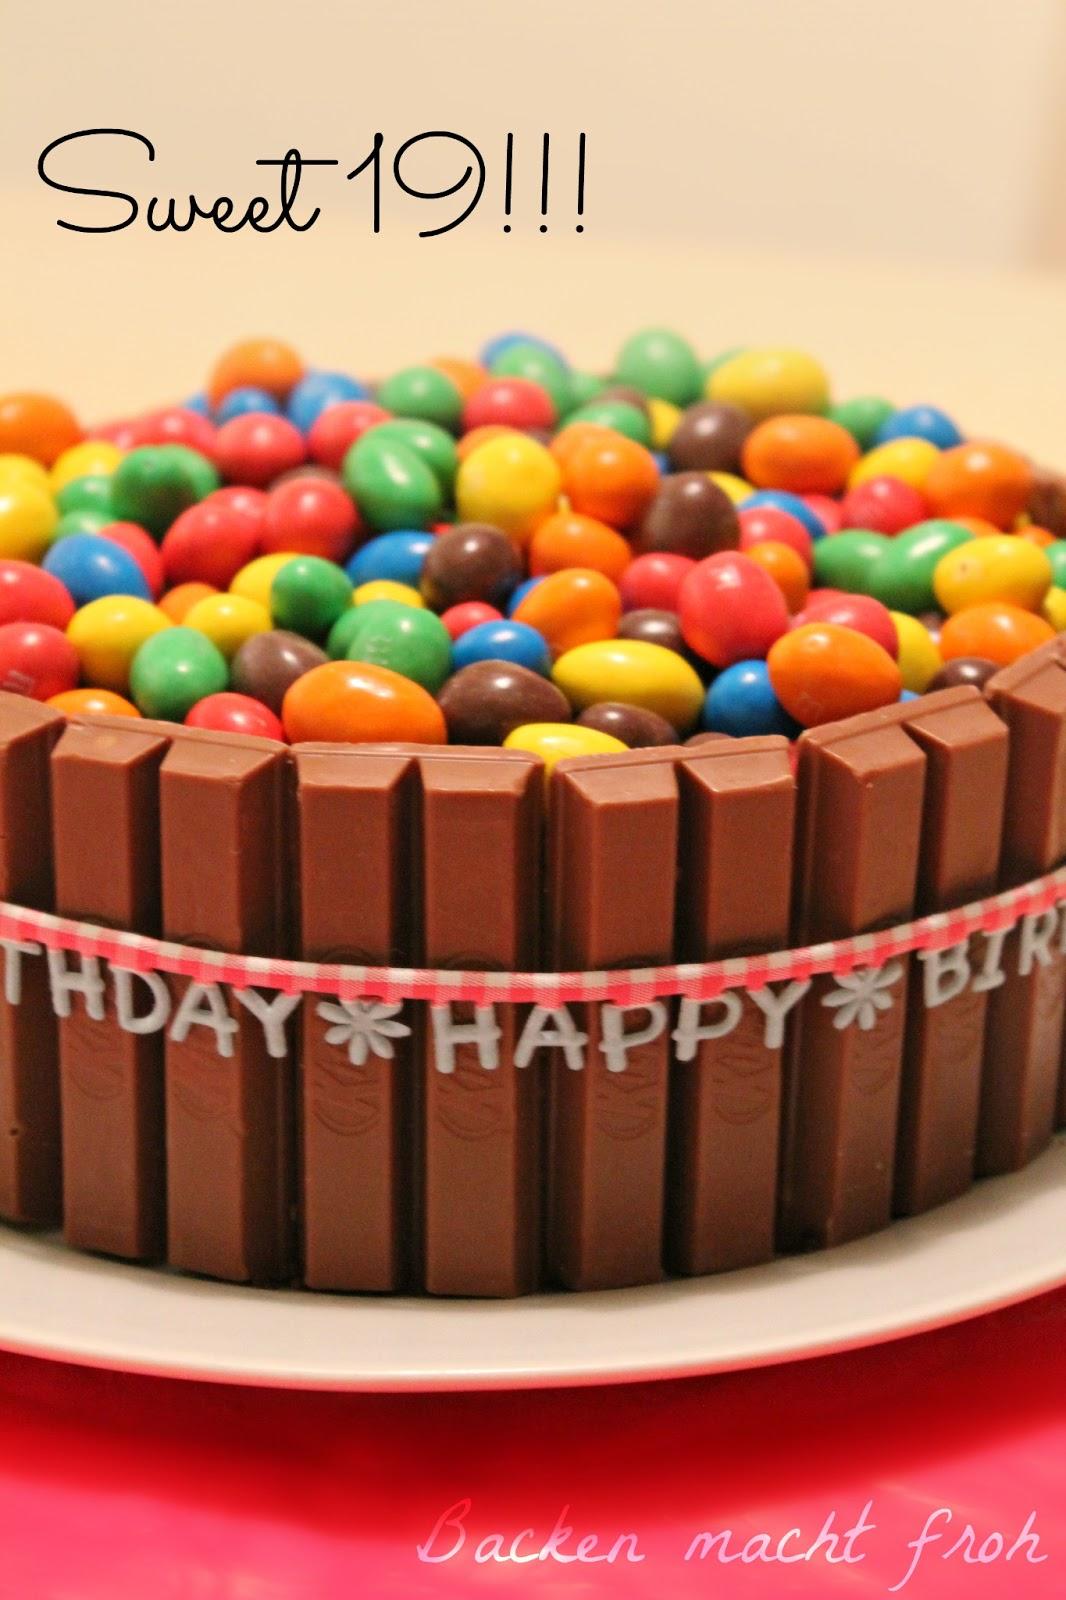 Backen Macht Froh Kochen Ebenso Geburtstagskuchen Sweet 19